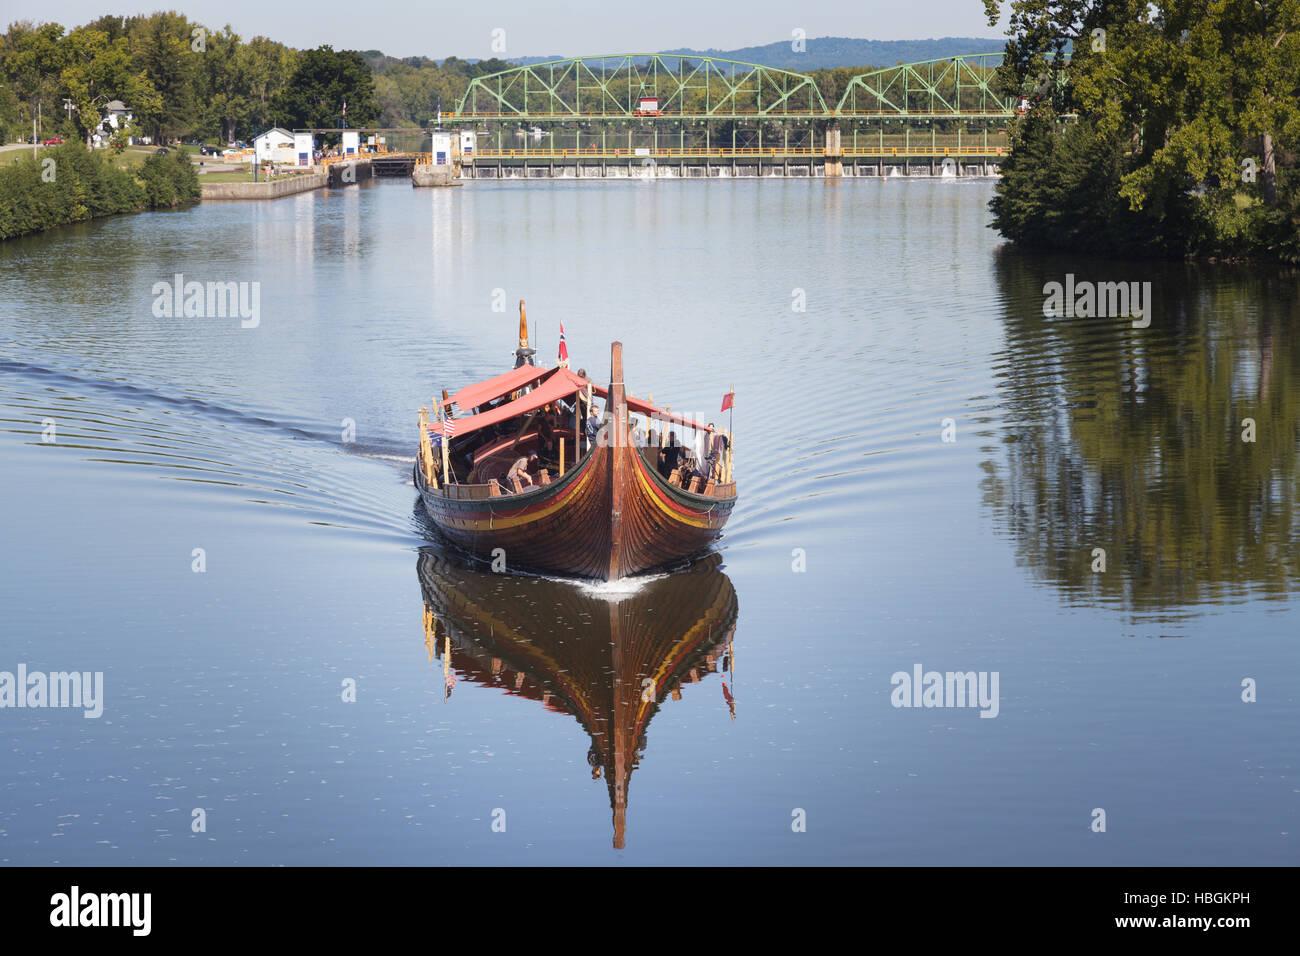 Viking longship replica Draken Harald Hårfagre passes through Fort Plain, Montgomery County, New York. - Stock Image